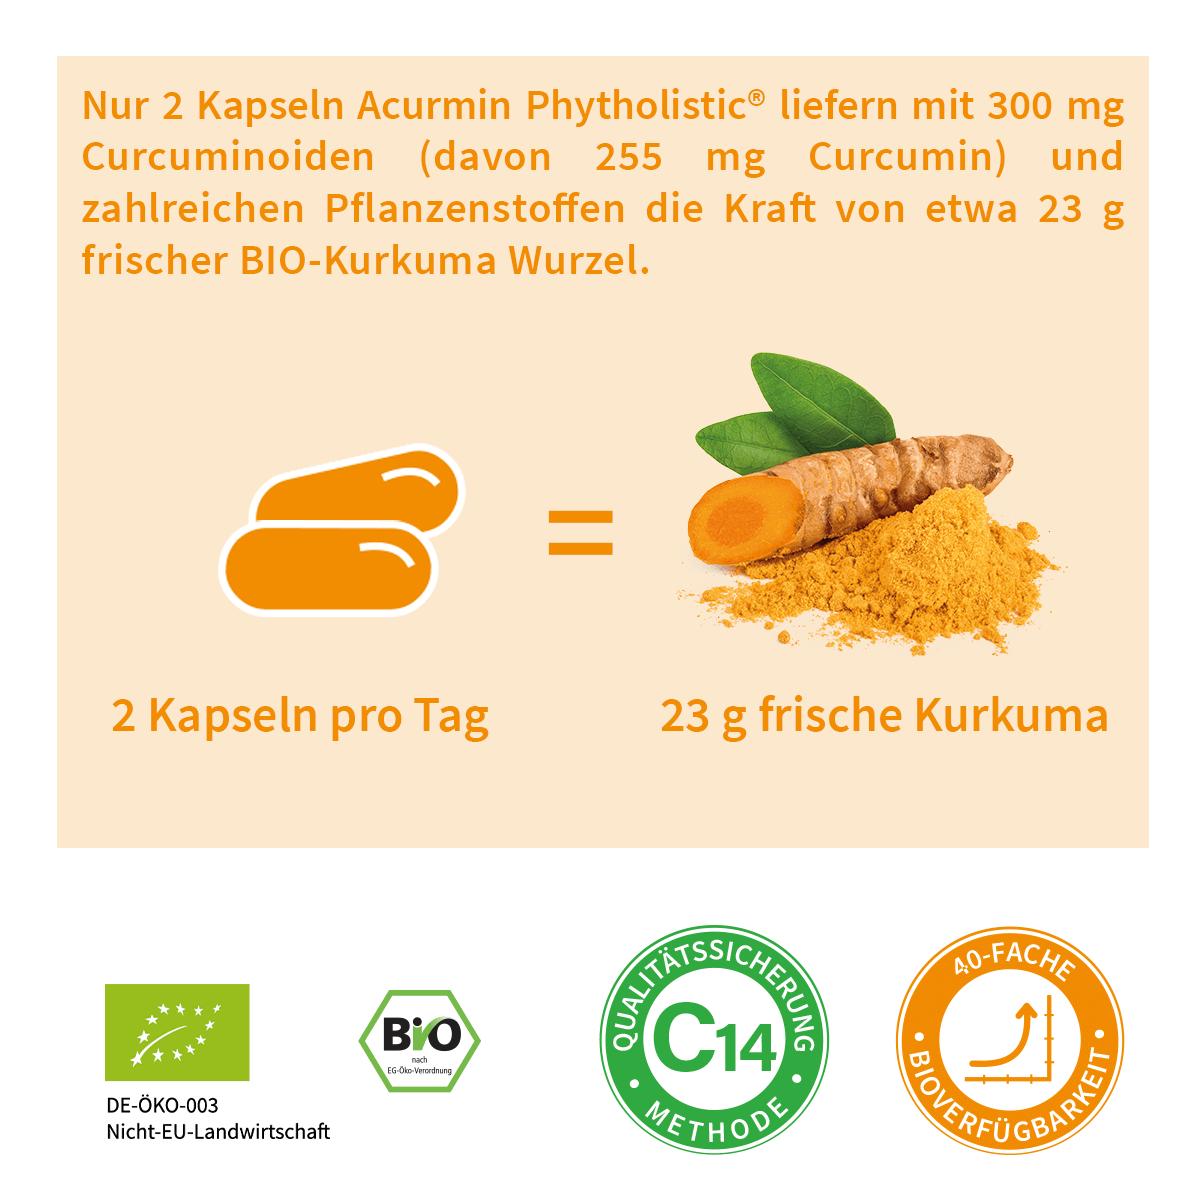 kurkuma-kapseln-bio-acurmin-phytholistic-60-stueck-grafik-dosierung-1200x1200